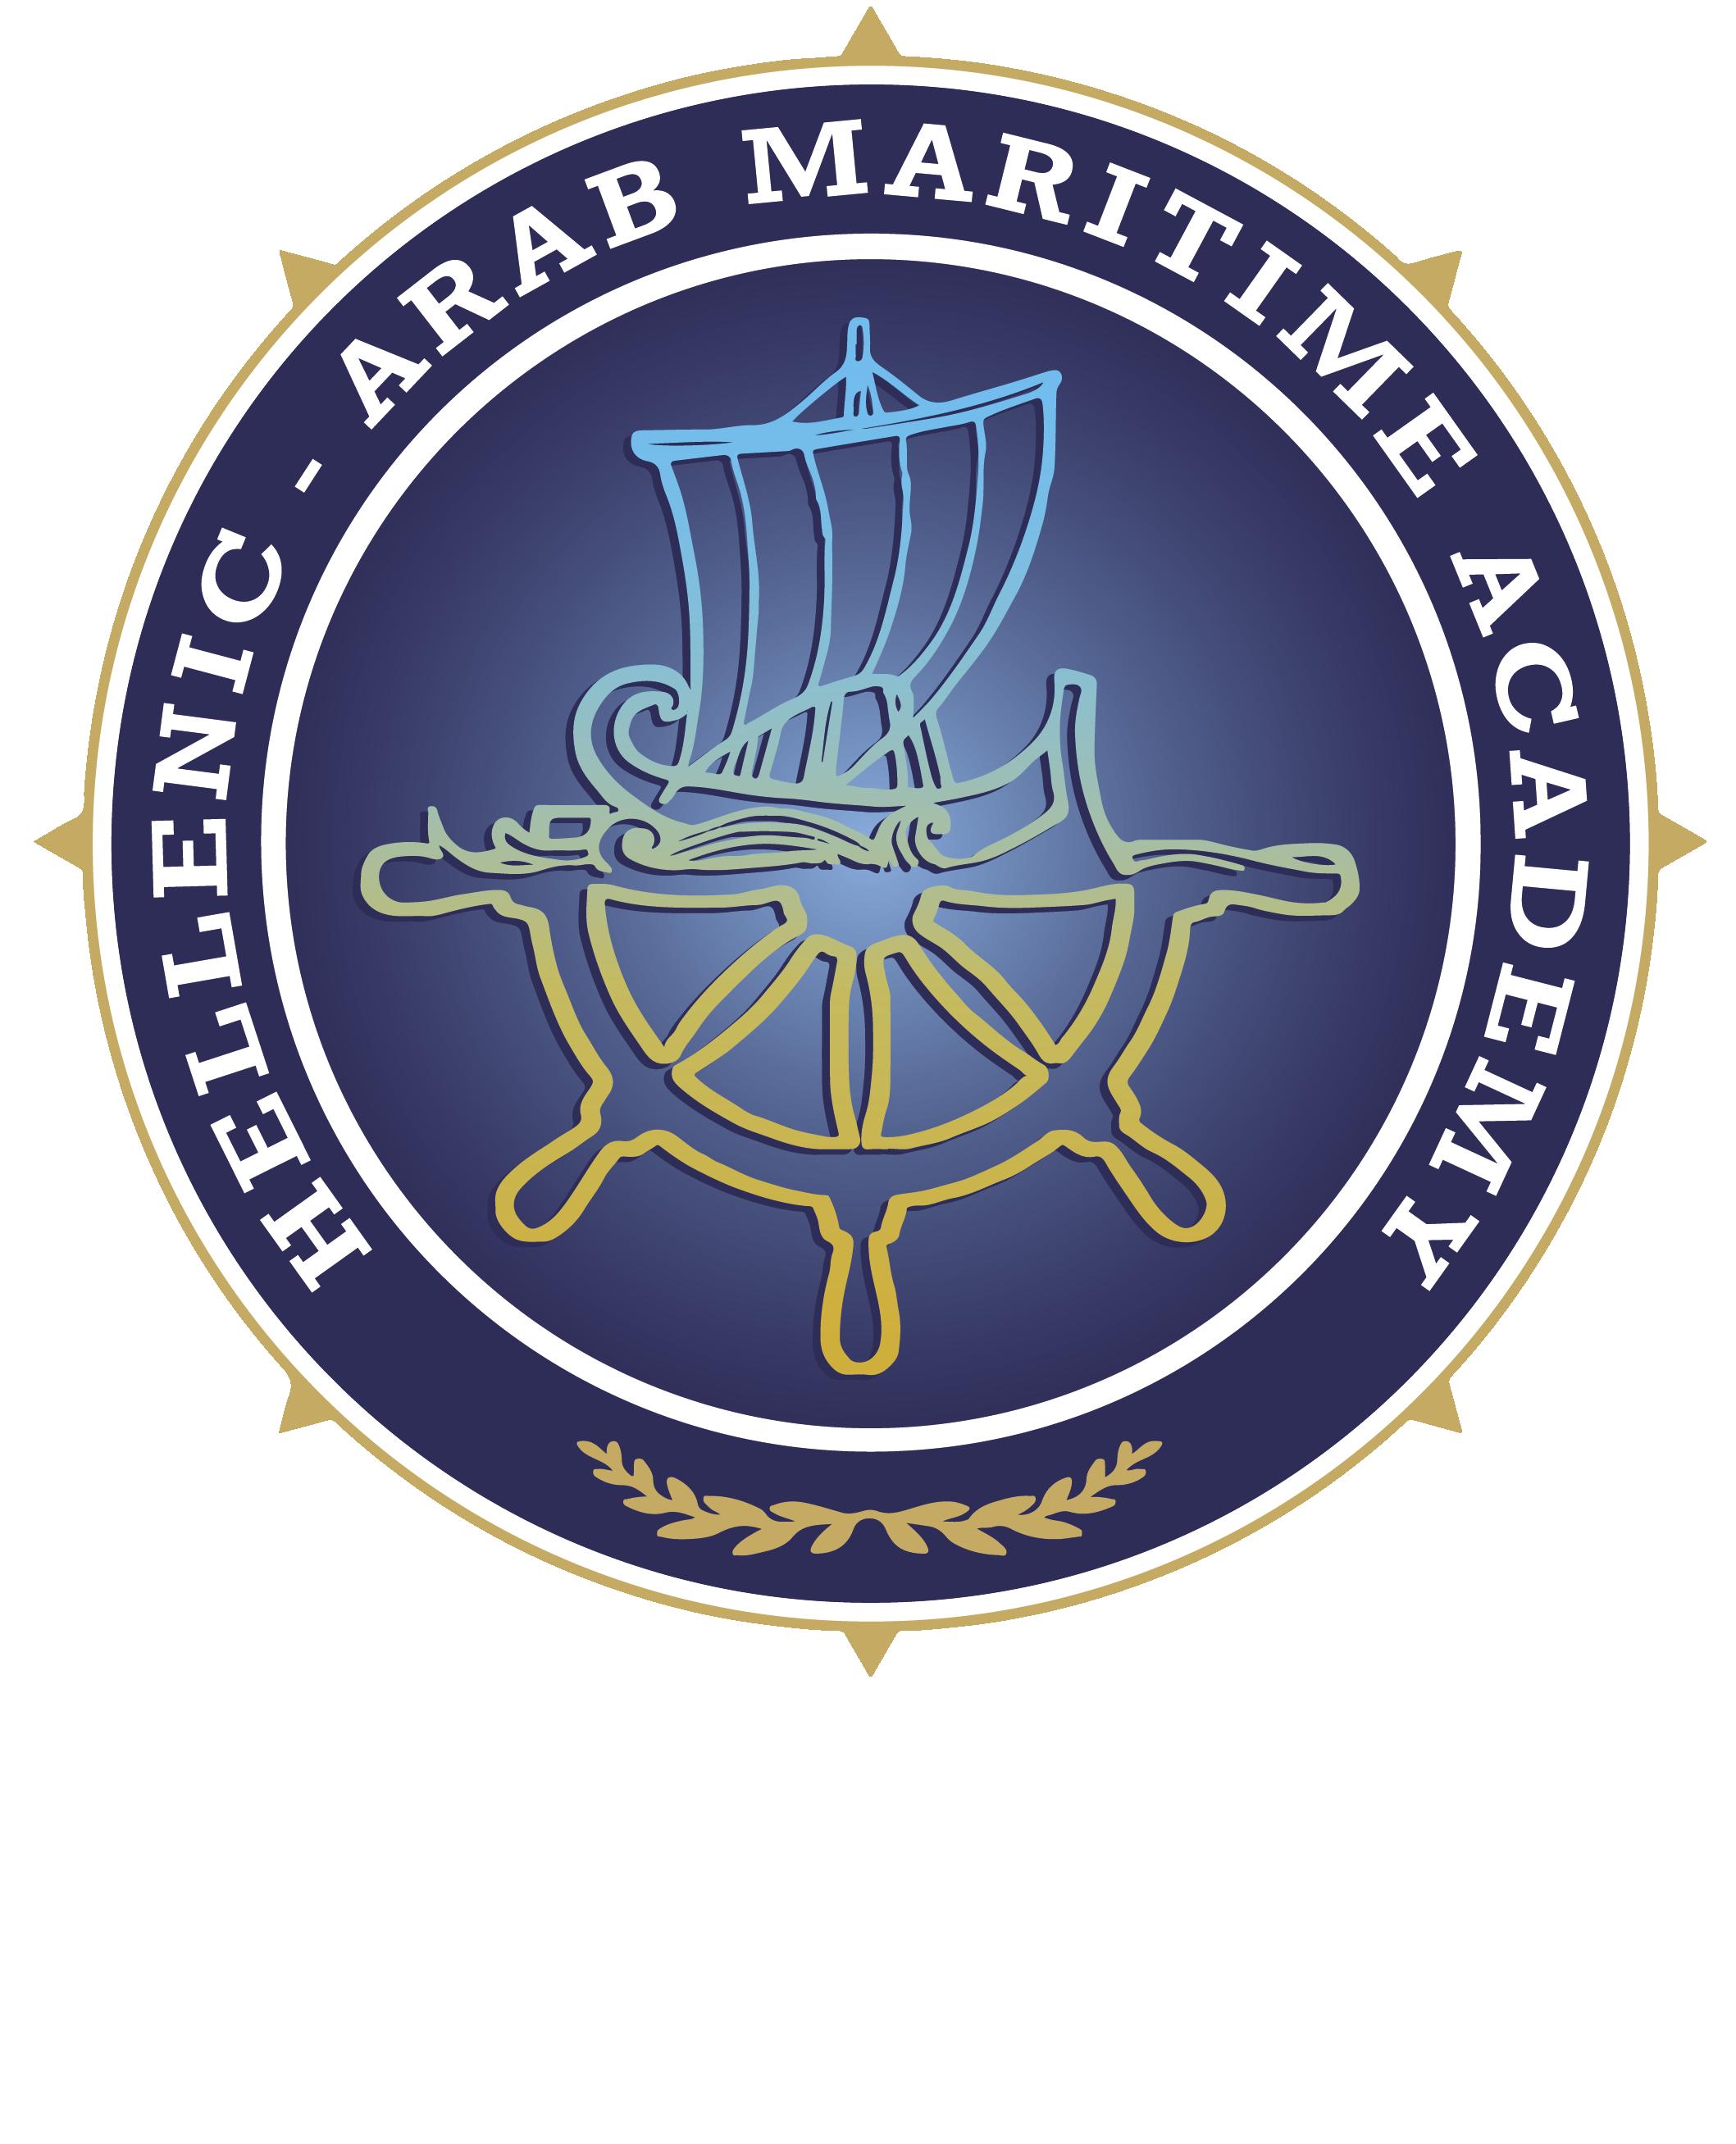 Hellenic Arab Maritime Academy